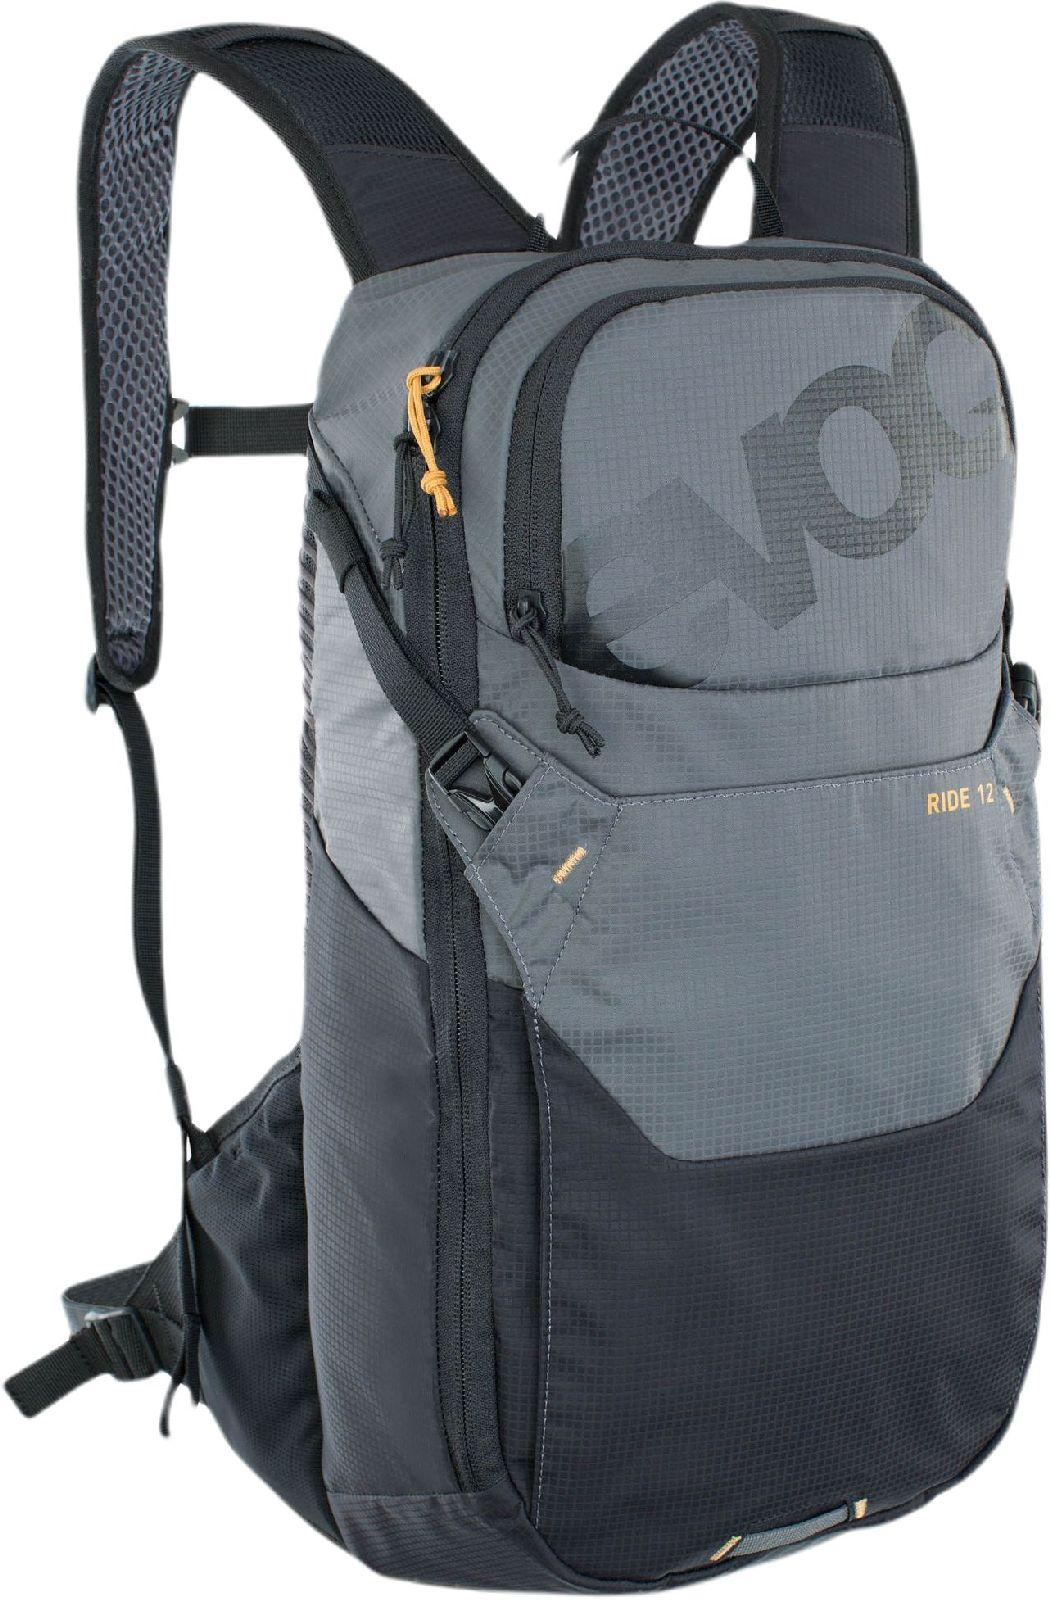 Evoc Ride 12L - carbon grey/black uni